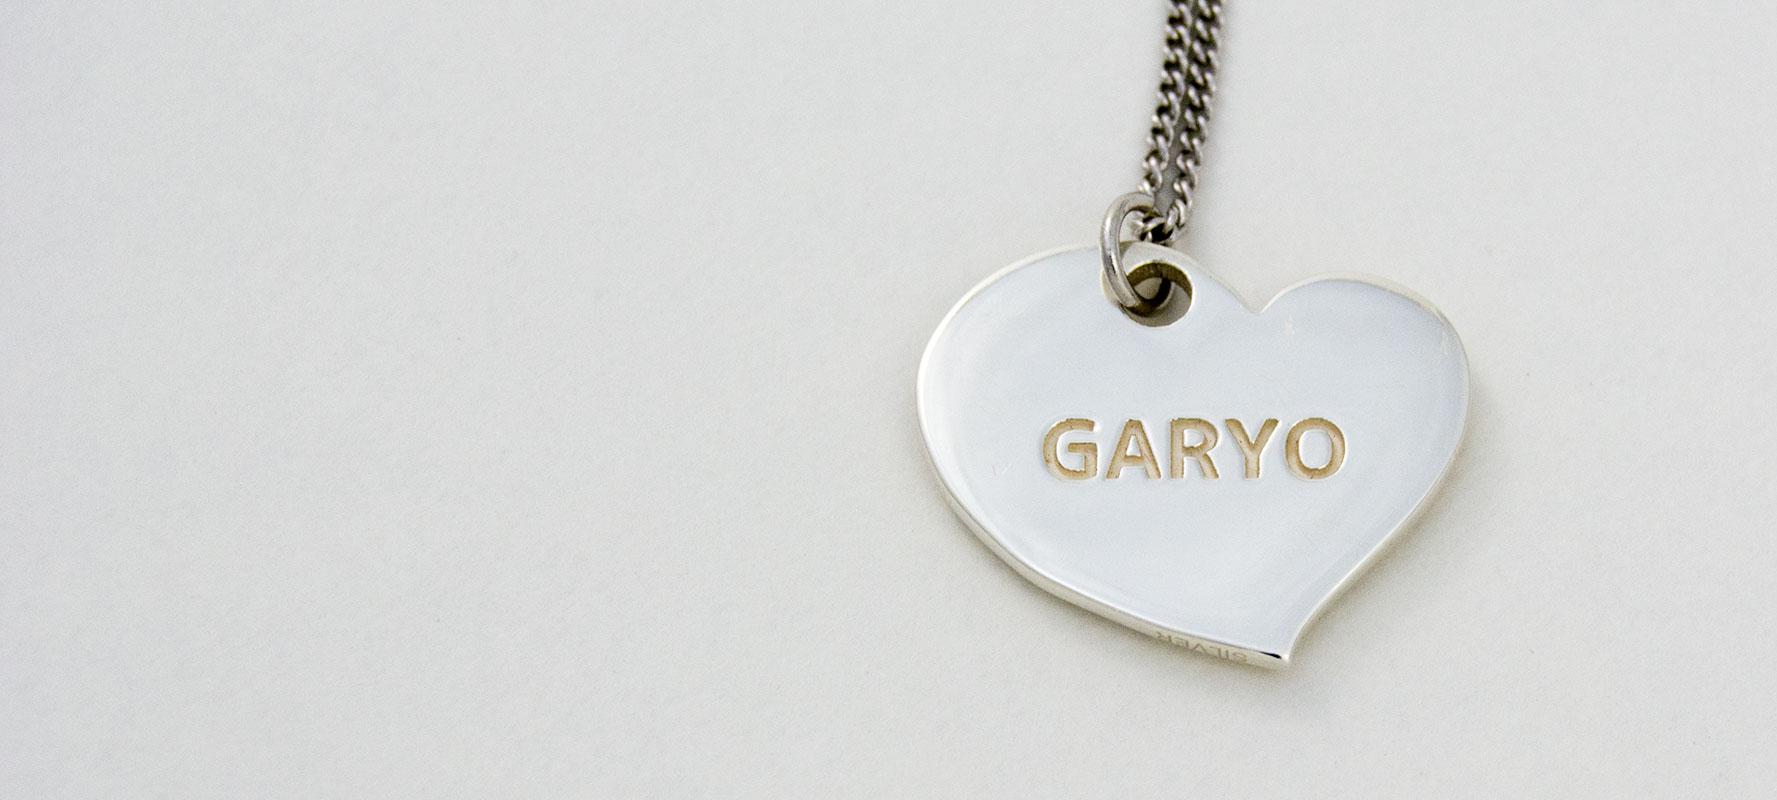 GARYO INC.